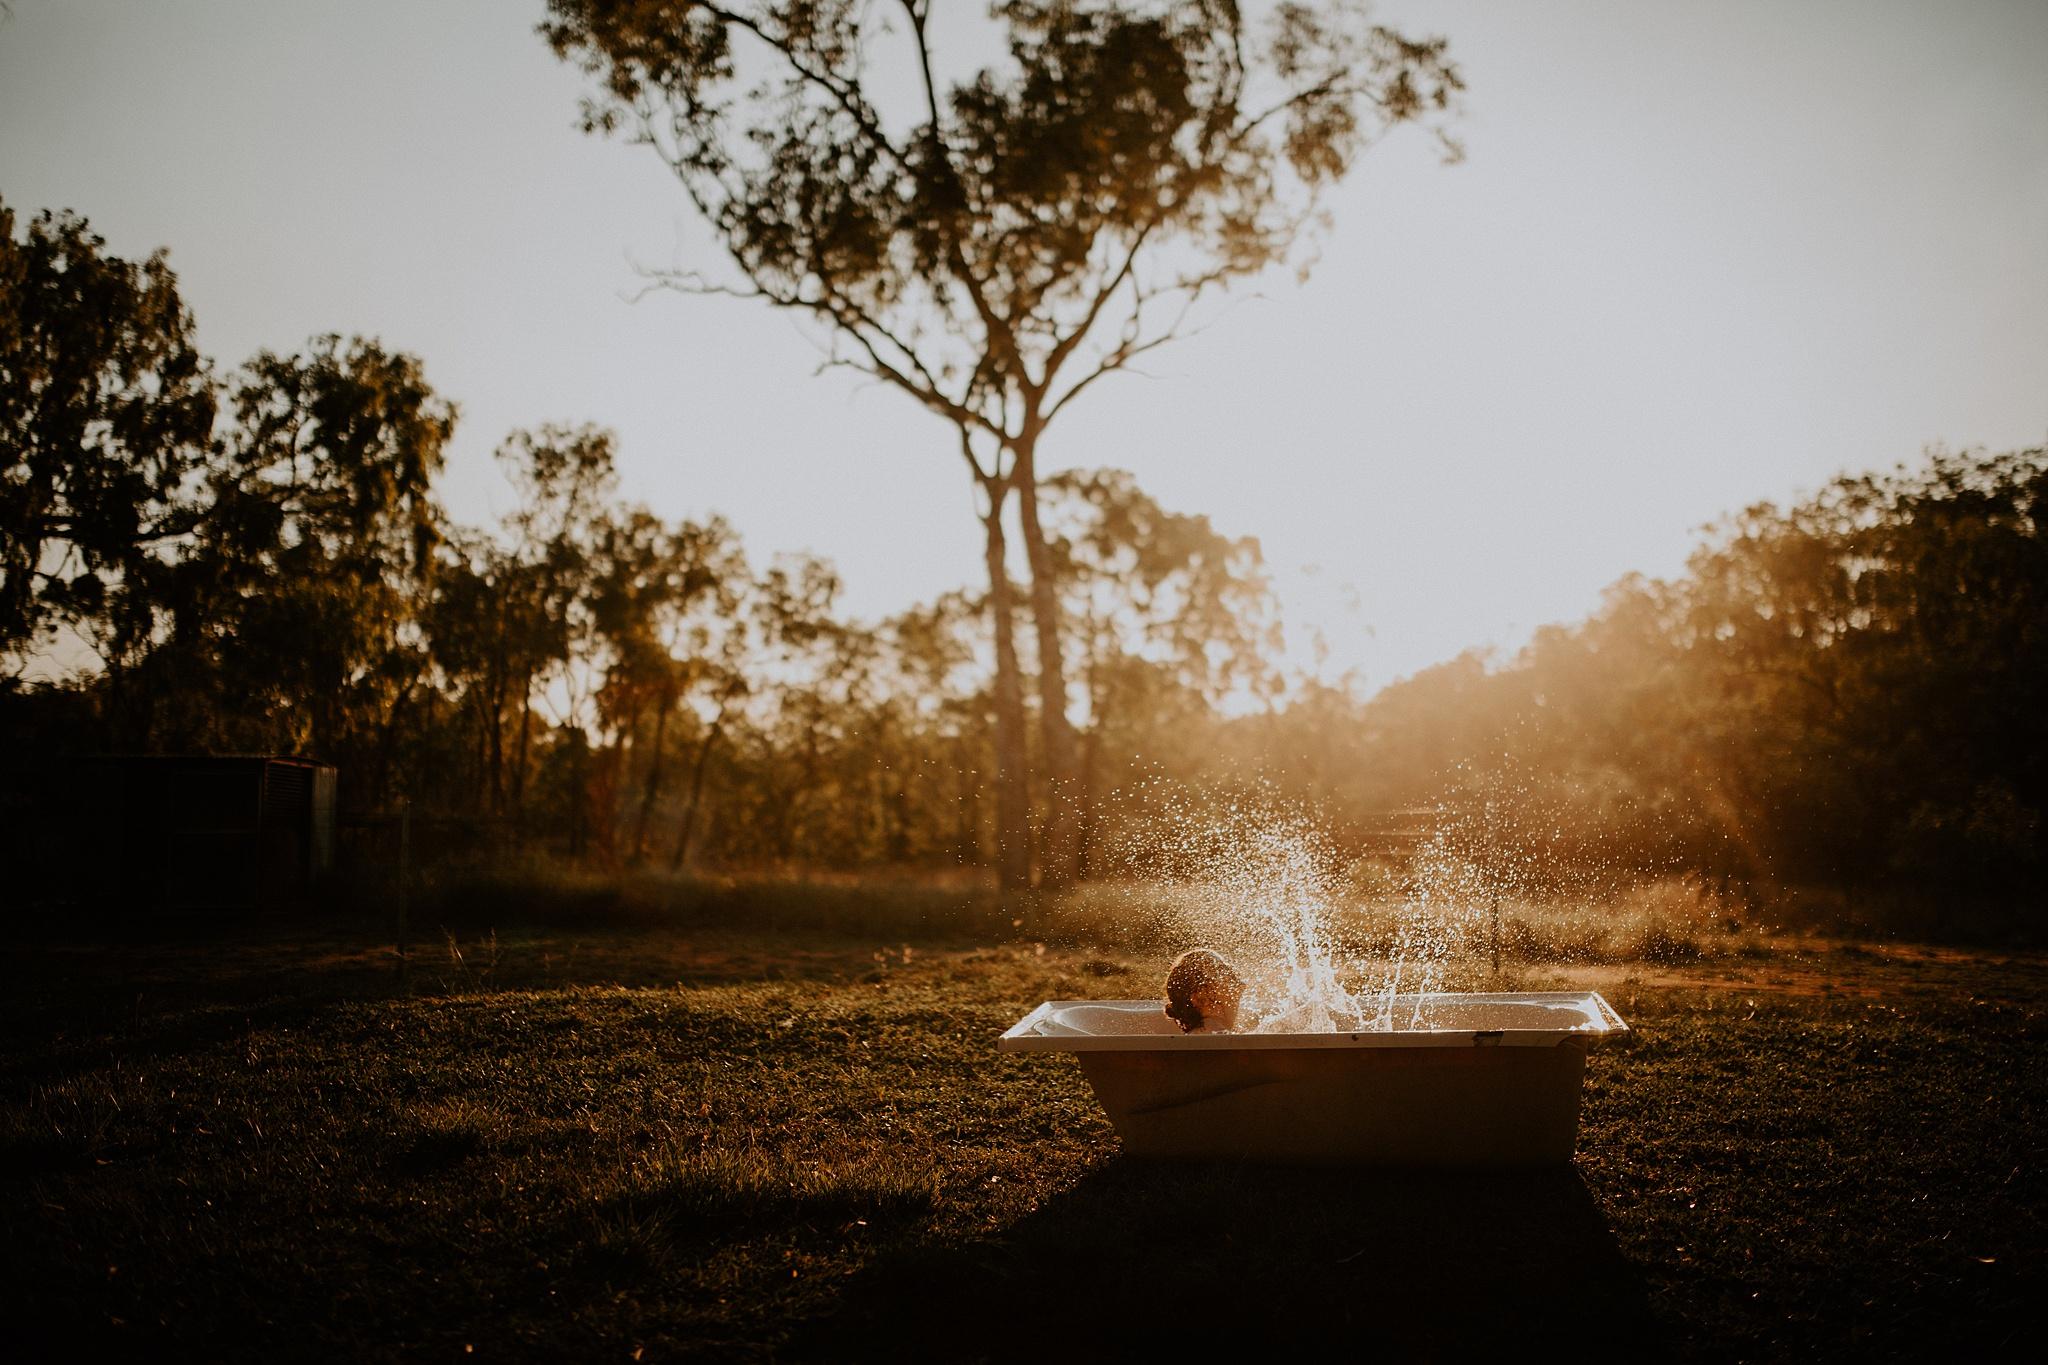 Camilla-French-Townsville-Cairns-Mission-Beach-Port-Douglas-Queensland-family-lifestyle-wedding-eleopment-photographer_0071.jpg